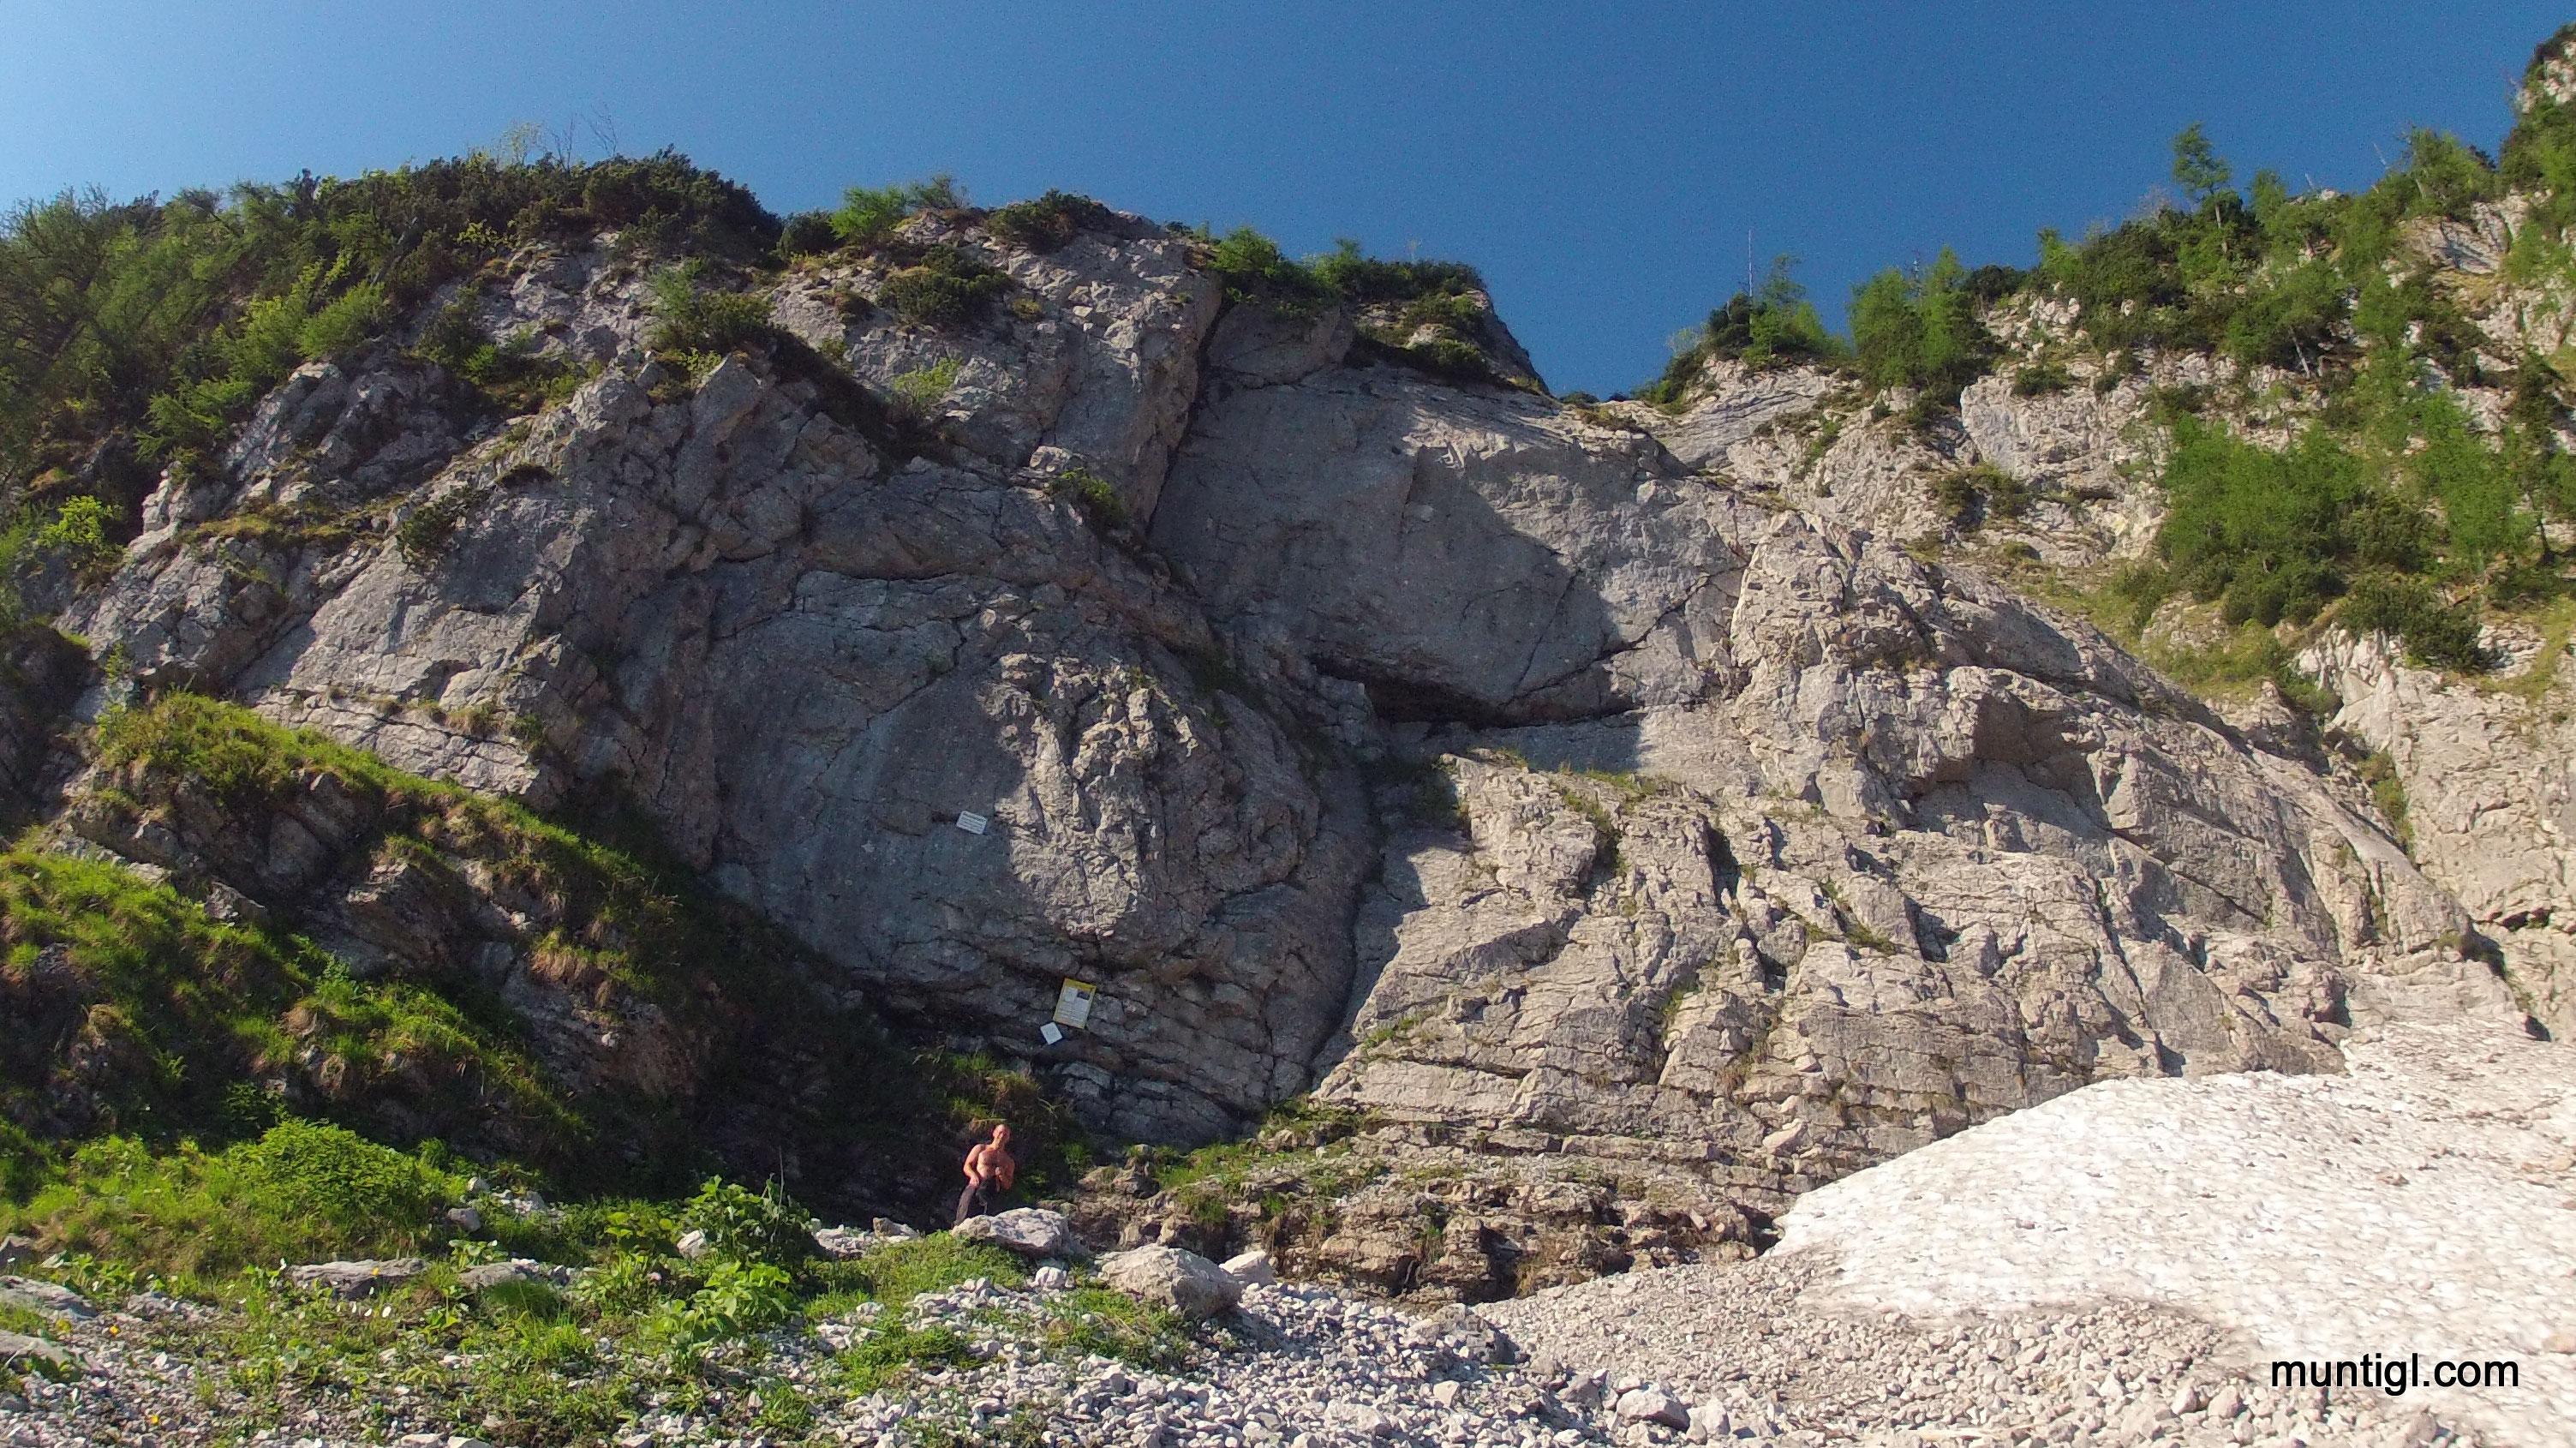 Pidinger Klettersteig : Pidinger klettersteig muntigl